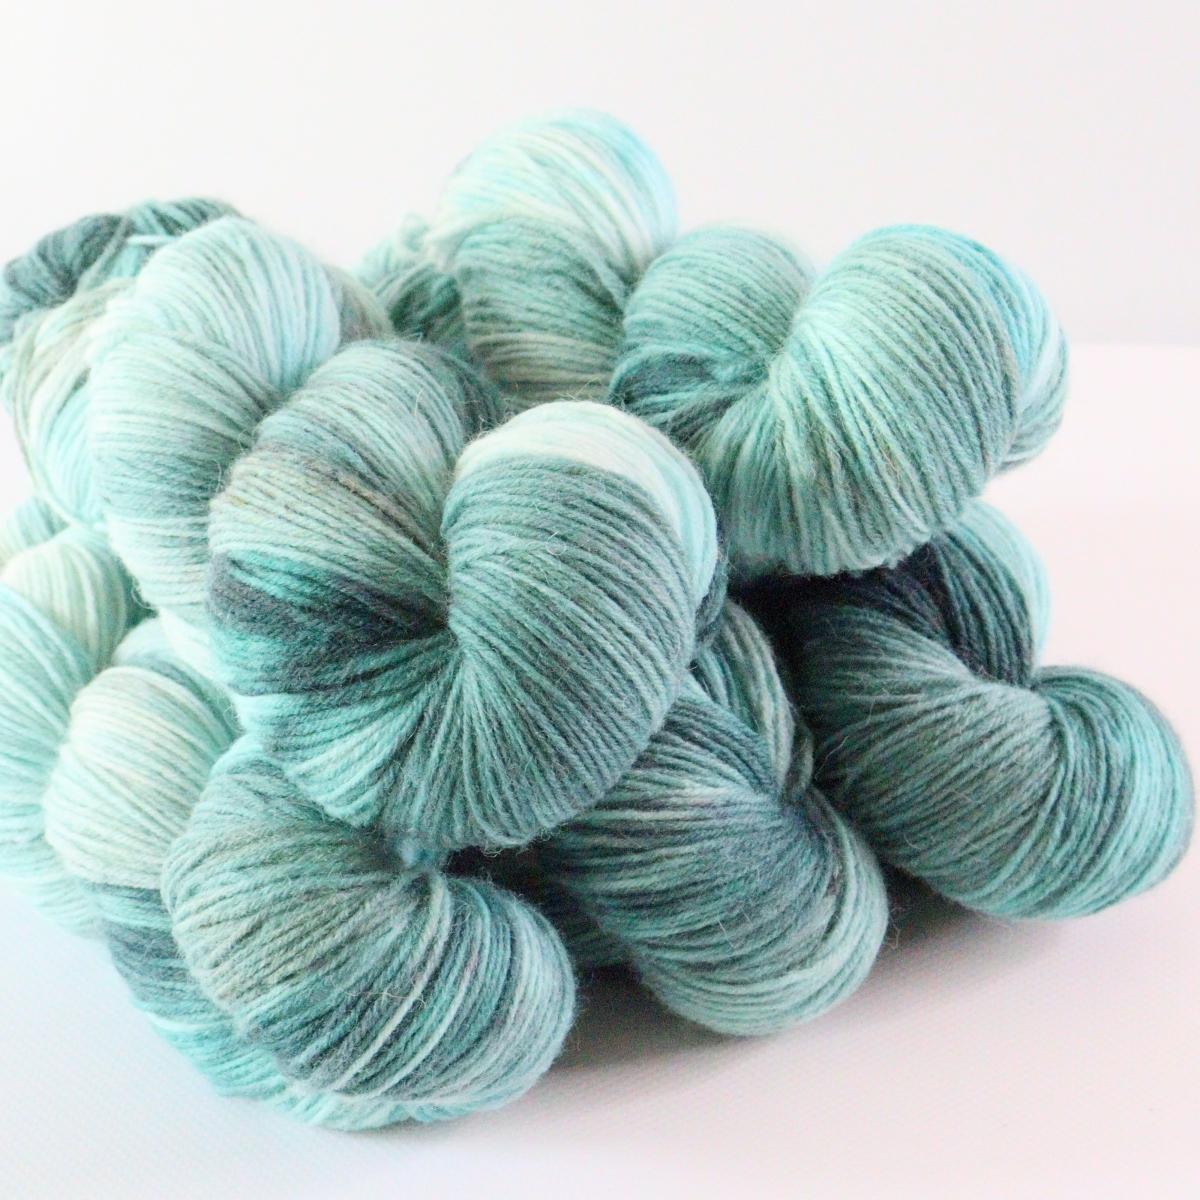 woodico.pro hand dyed yarn 074 5 1200x1200 - Hand dyed yarn / 074